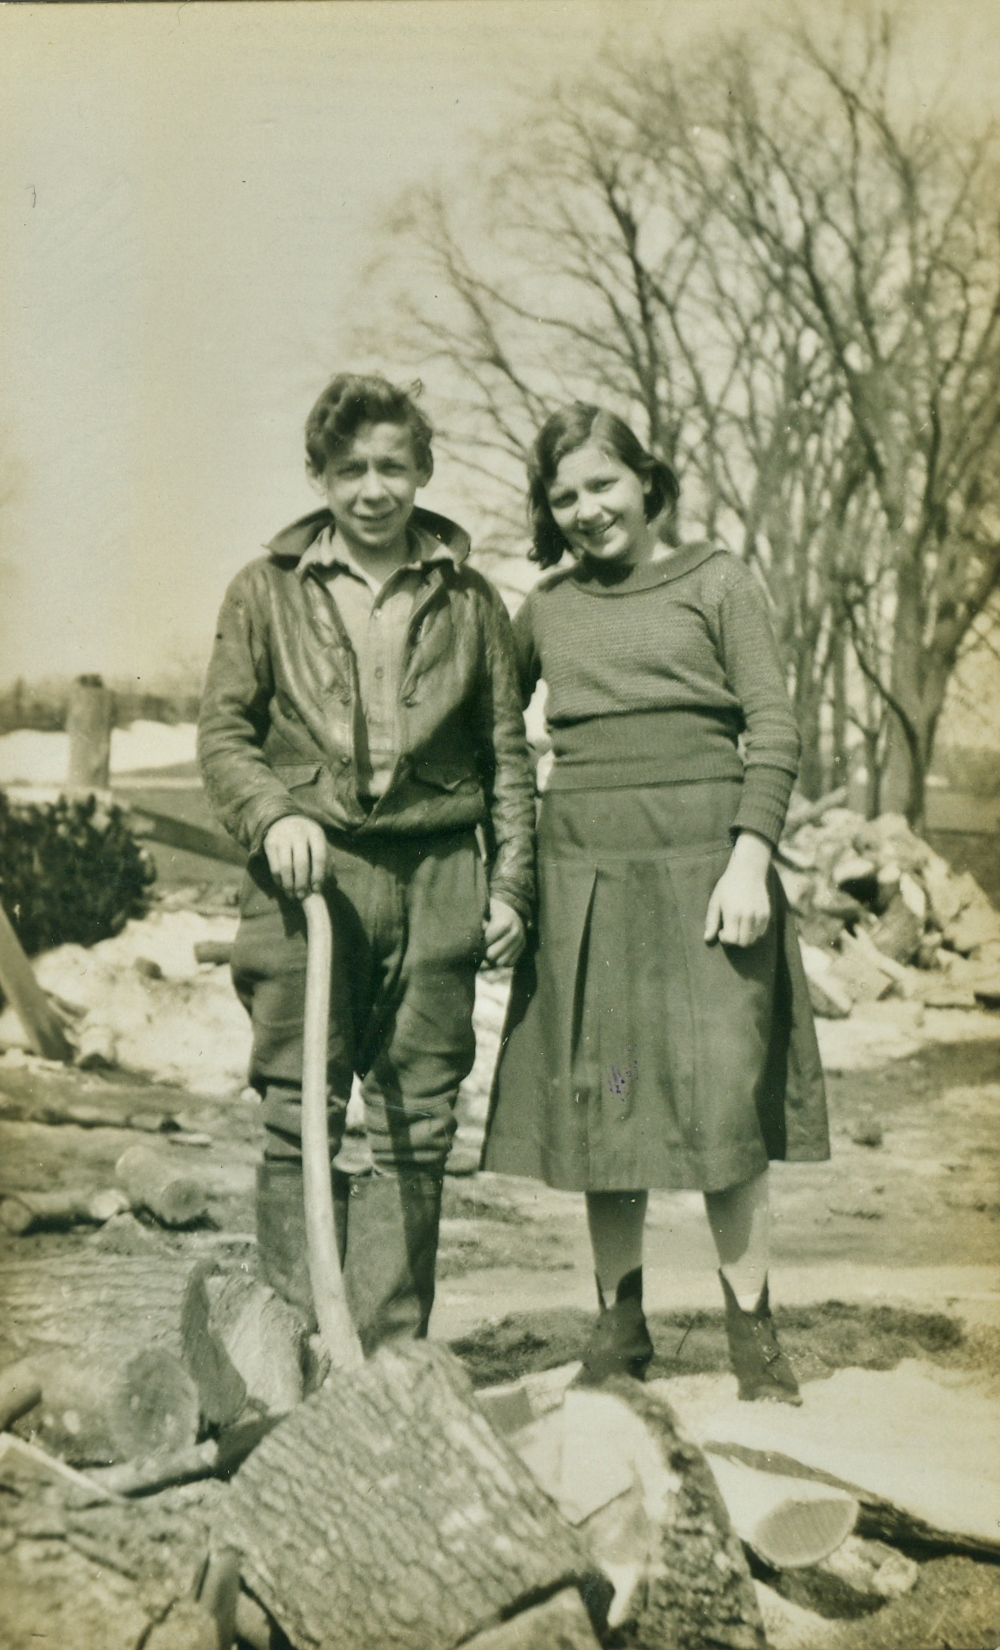 Earl & Edna Vansickle 1934